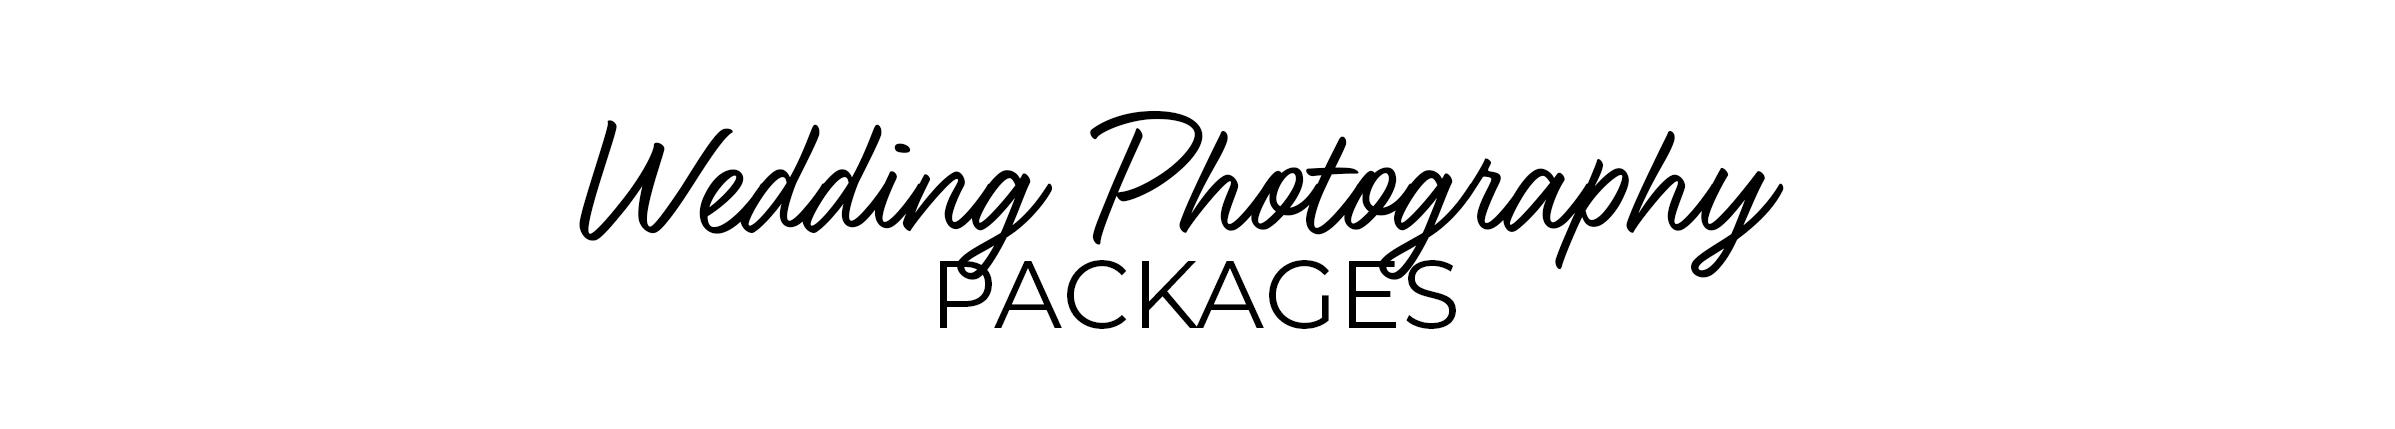 pricing-photography-header-orlando-wedding-photographer.jpg